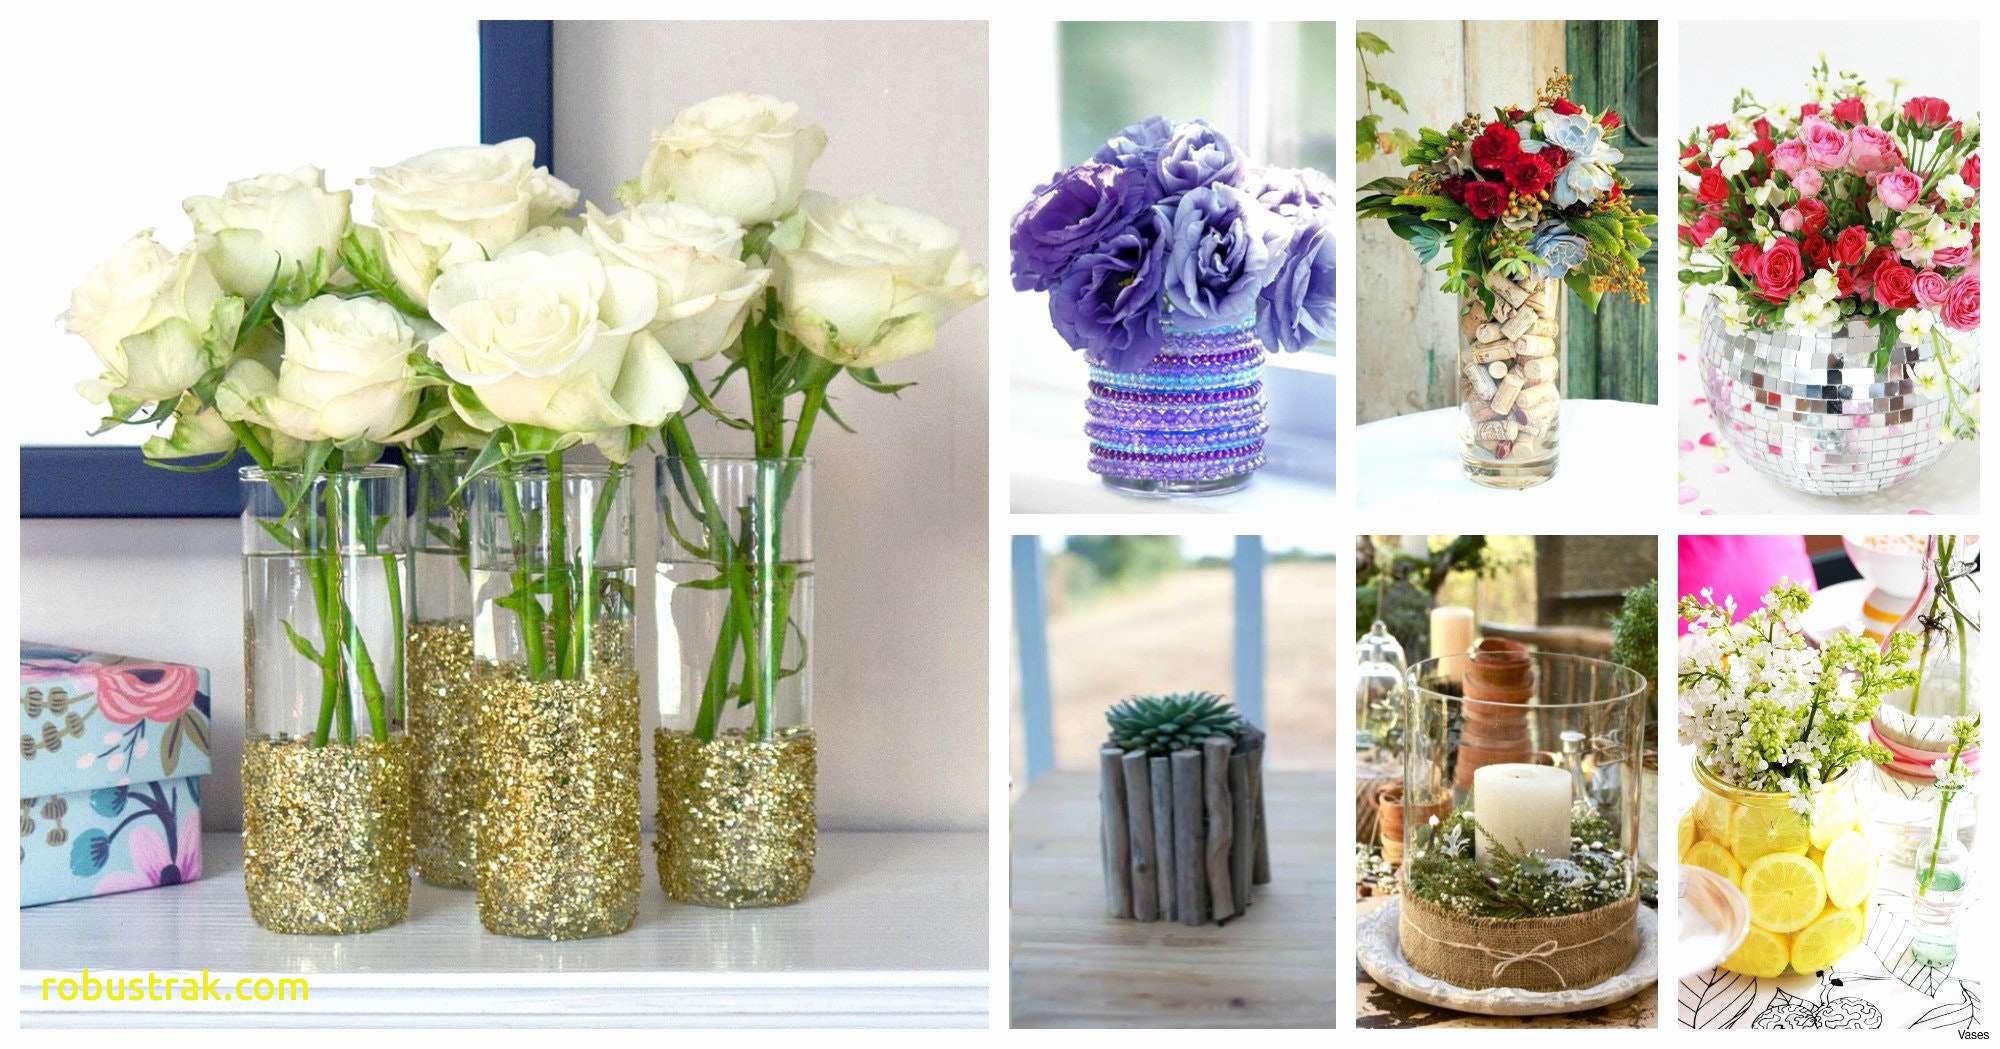 hurricane vases for centerpieces of luxury cheap wedding decorations diy home design ideas throughout dsc h vases square centerpiece dsc i 0d cheap ideas with unique into design ideas